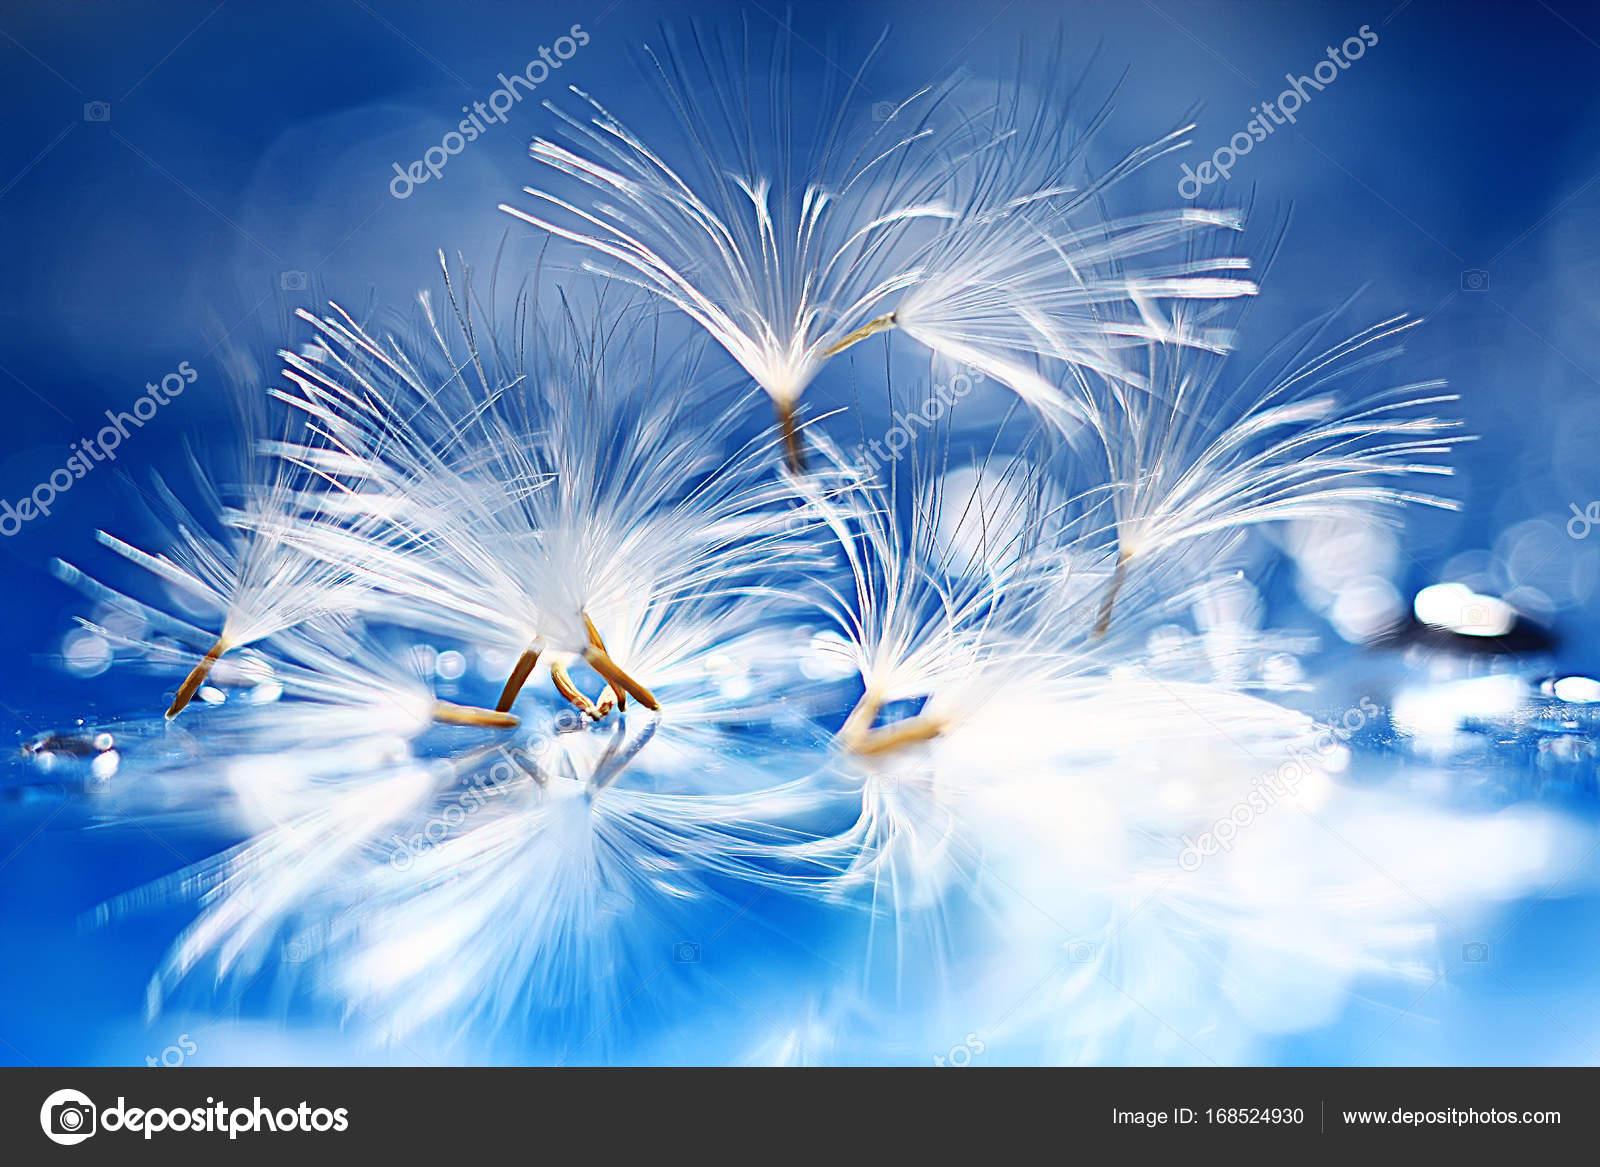 Dry Dandelion Parachute Seeds Light Blue Background Summer Nature